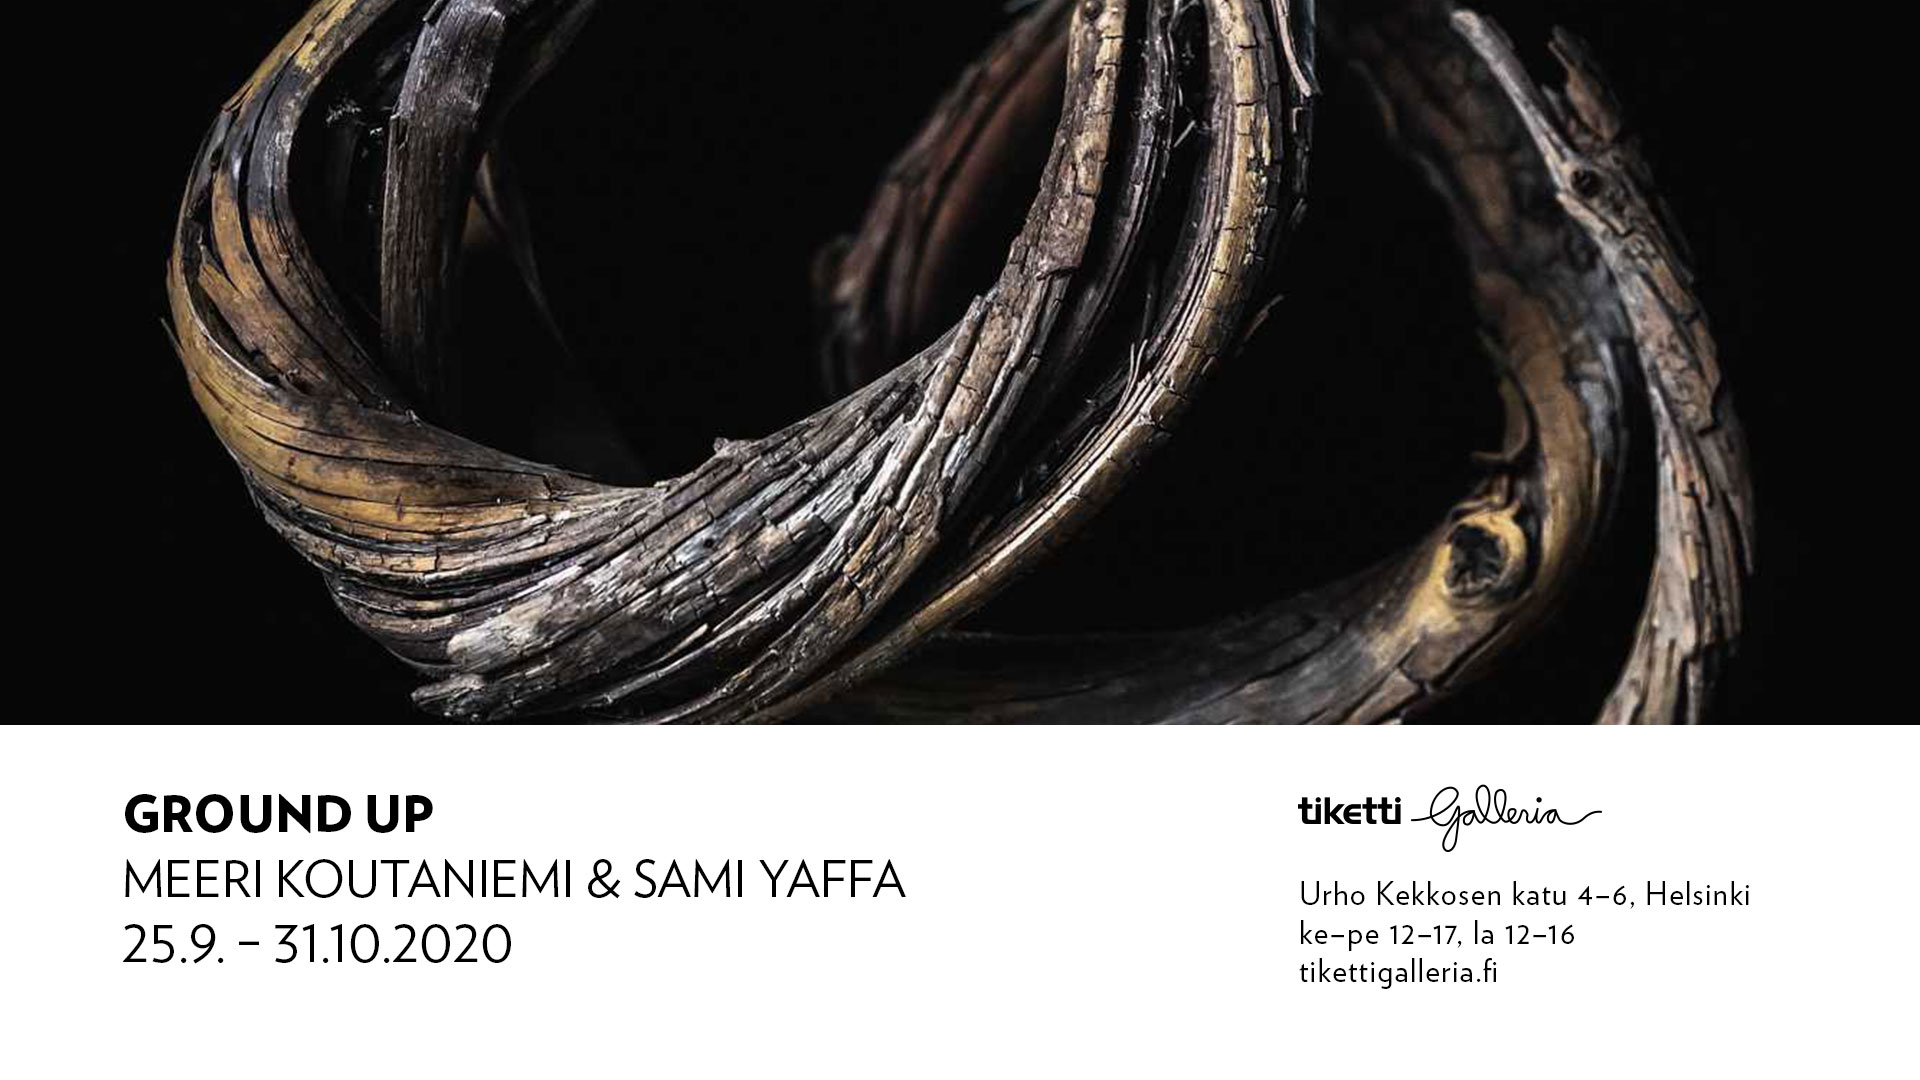 Link to event Meeri Koutaniemi & Sami Yaffa